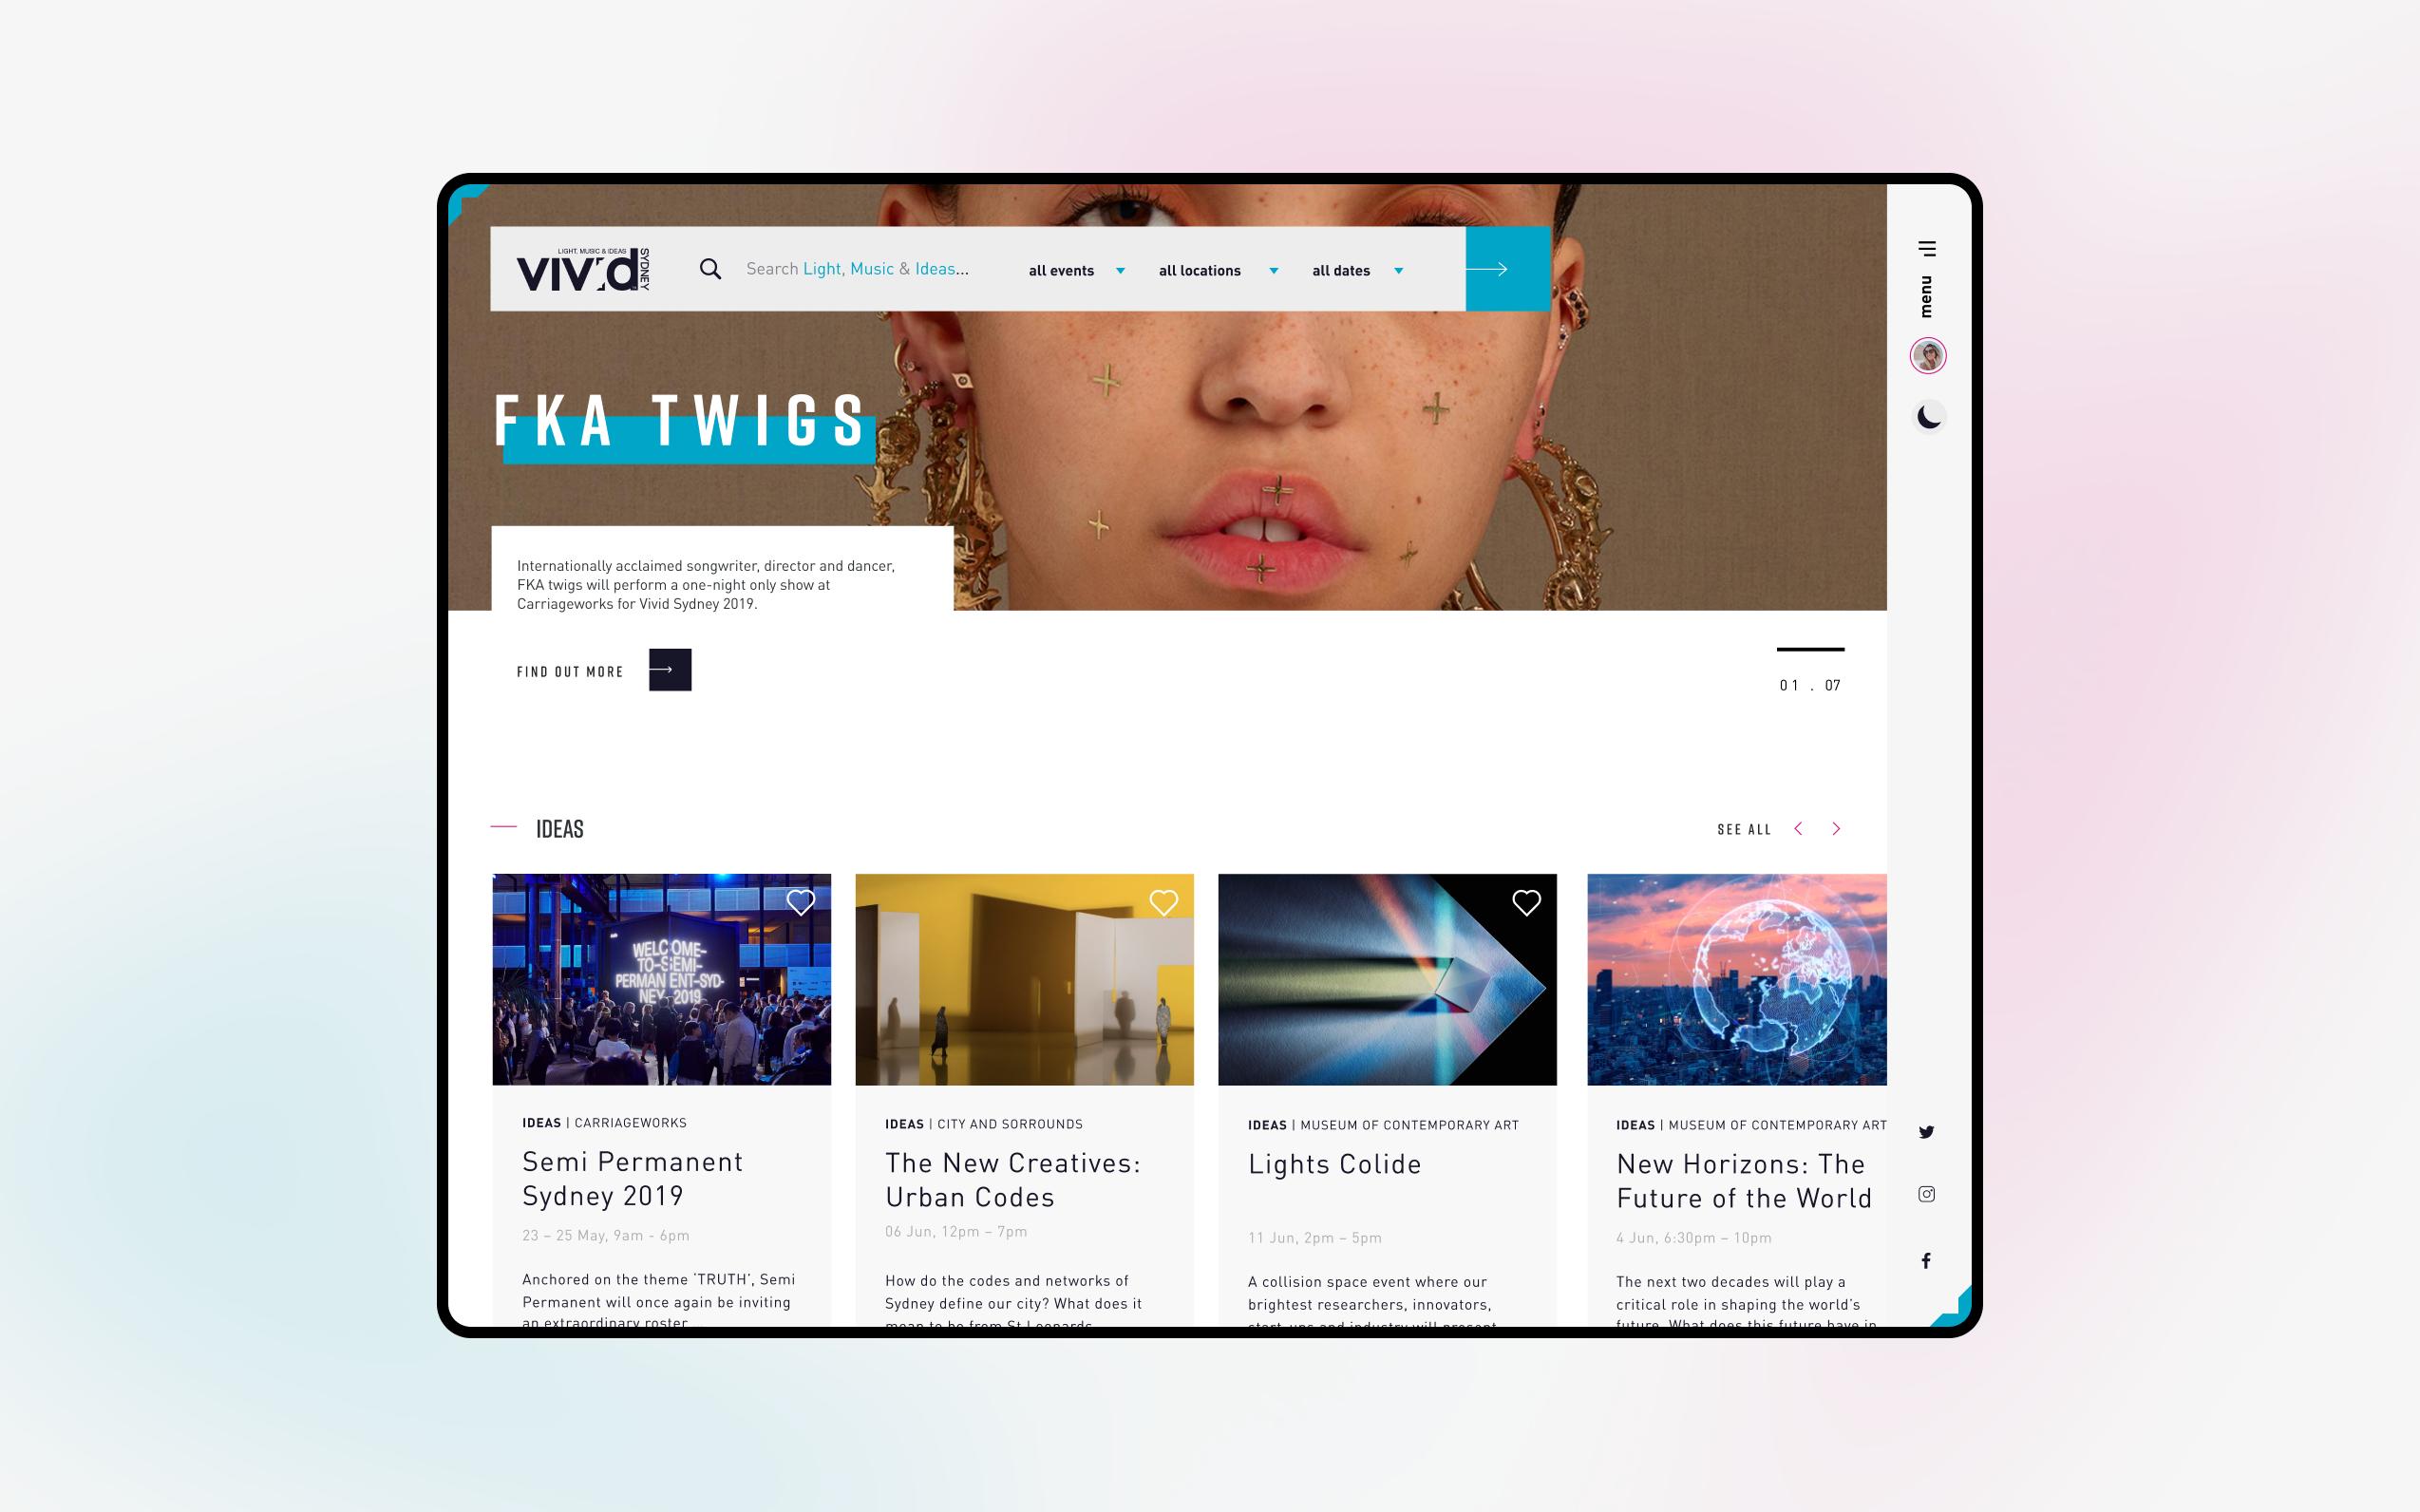 Desktop screen of the Vivid 2019 website homepage